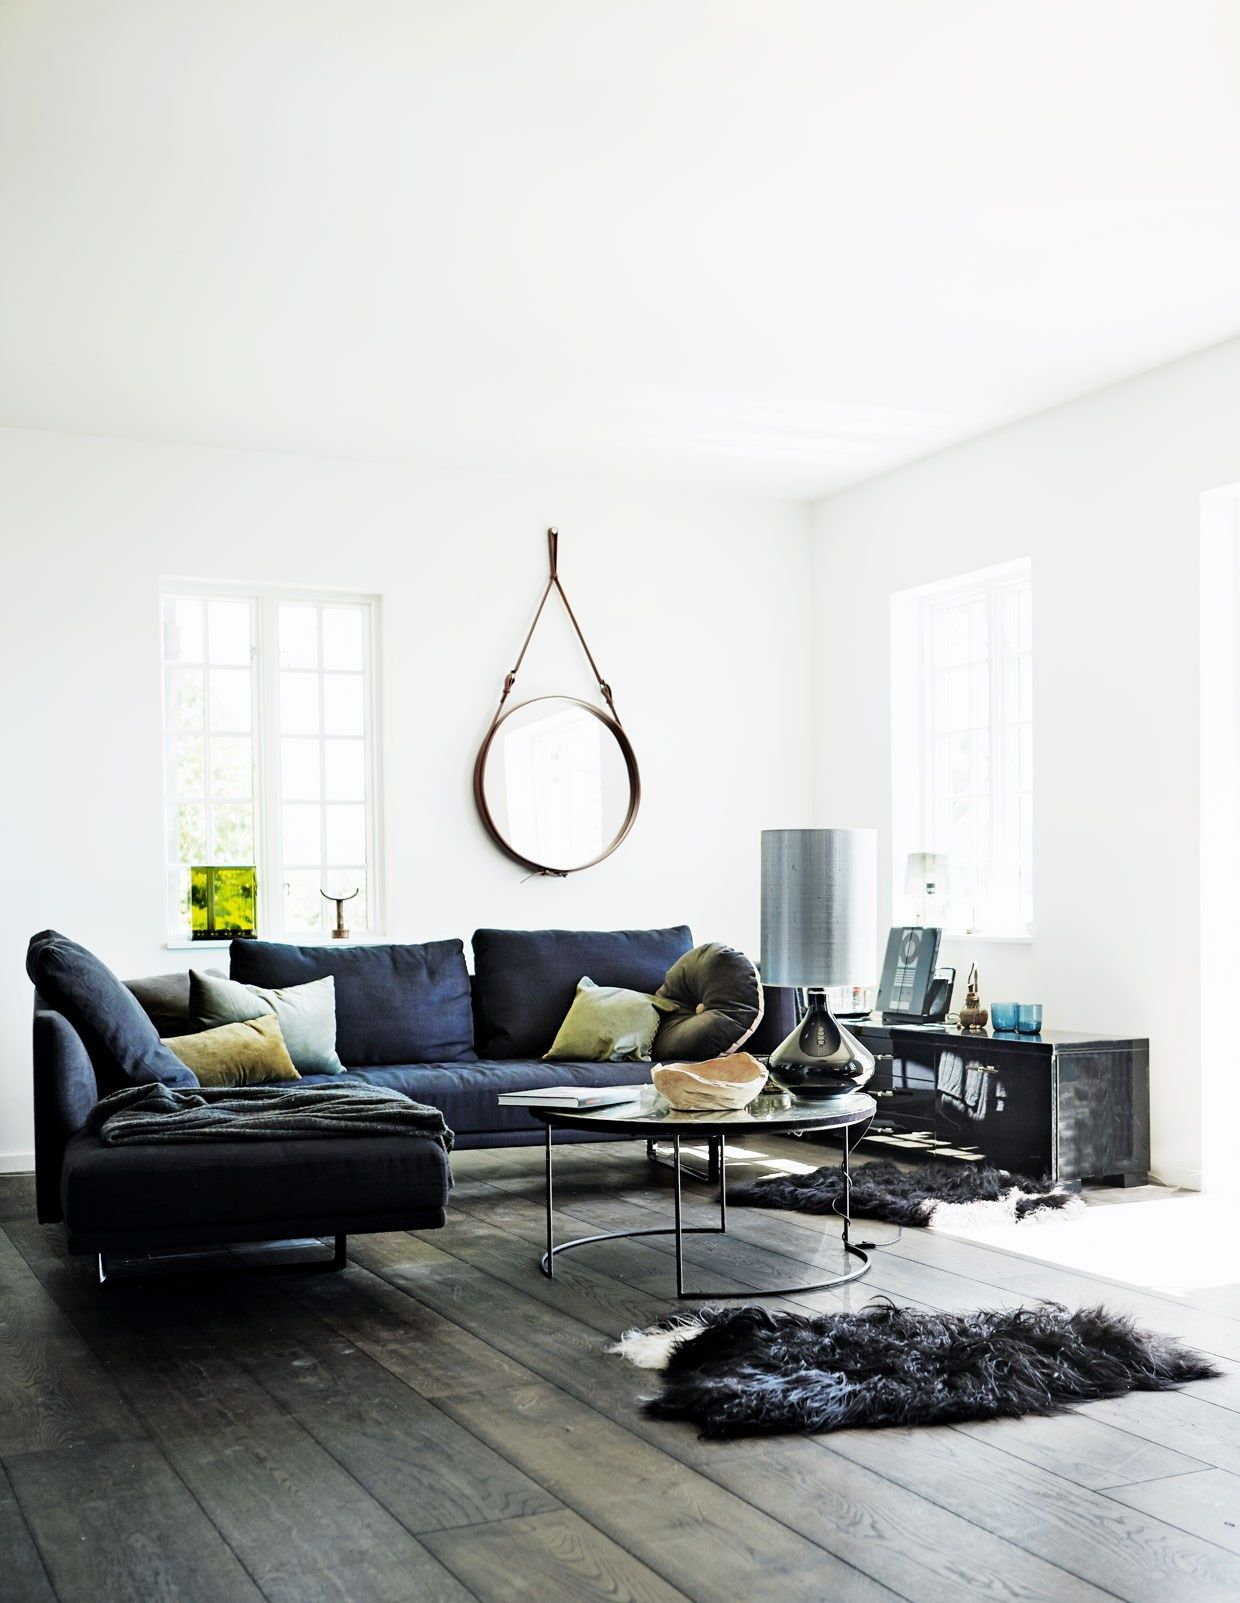 En bid af paradis | Pinterest | Coffee, Room and Interiors